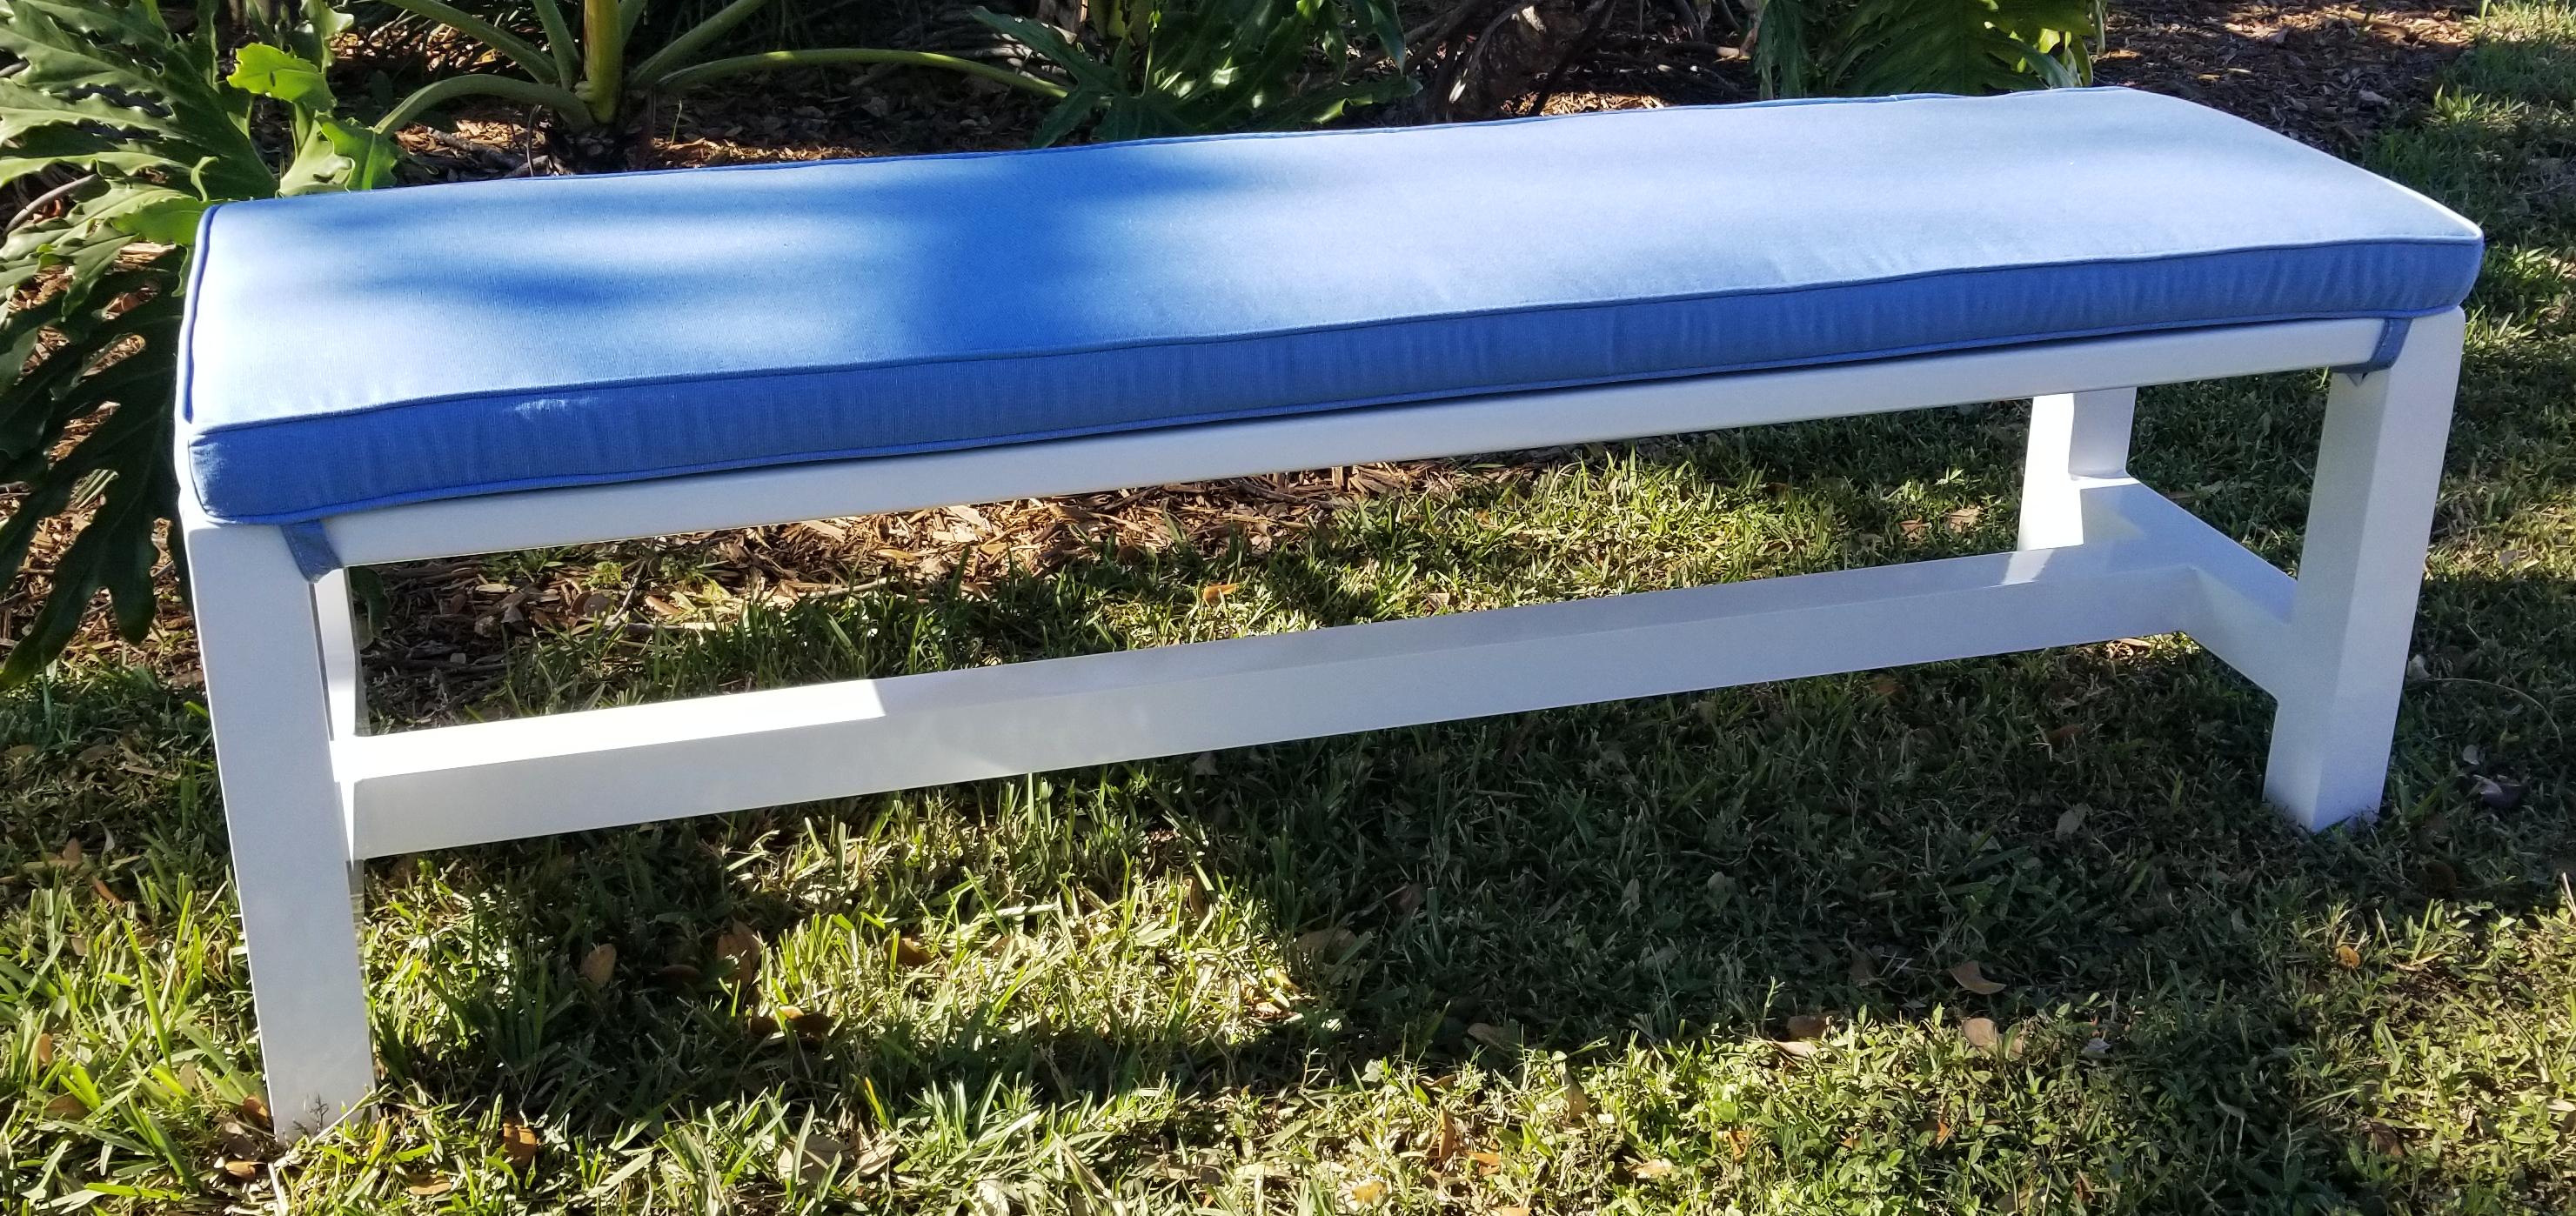 Millennium Bench with cushion